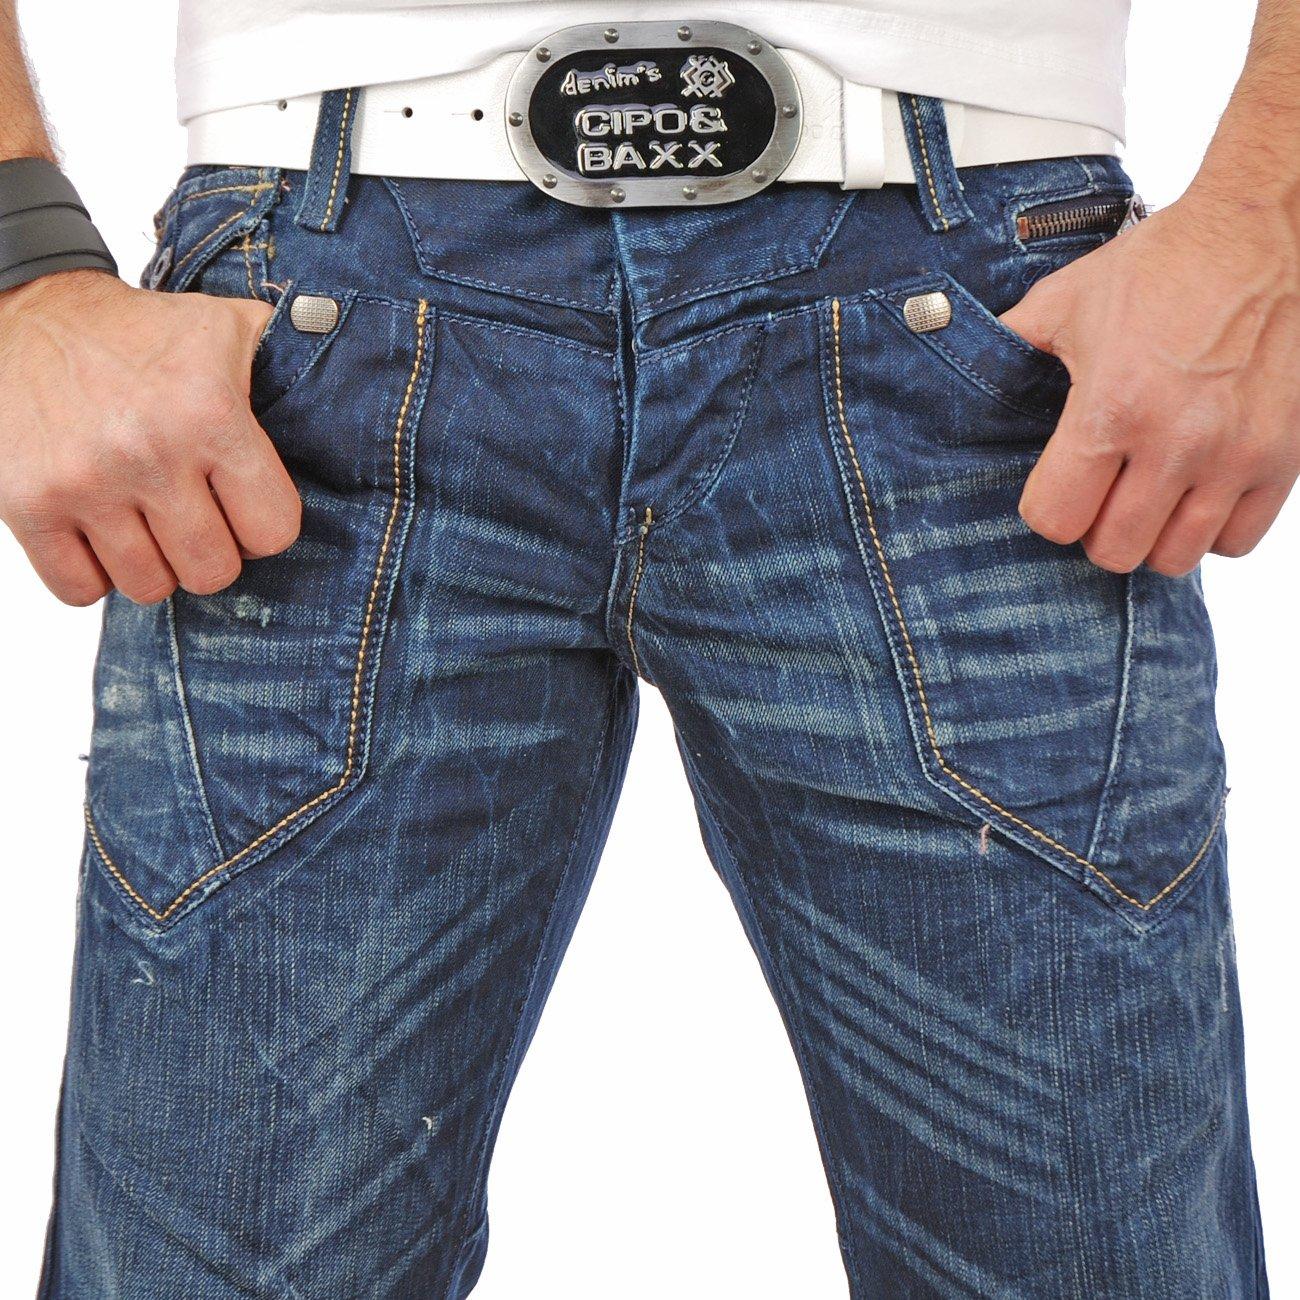 cipo baxx jeanshose herren club c 823 hosen g nstig. Black Bedroom Furniture Sets. Home Design Ideas